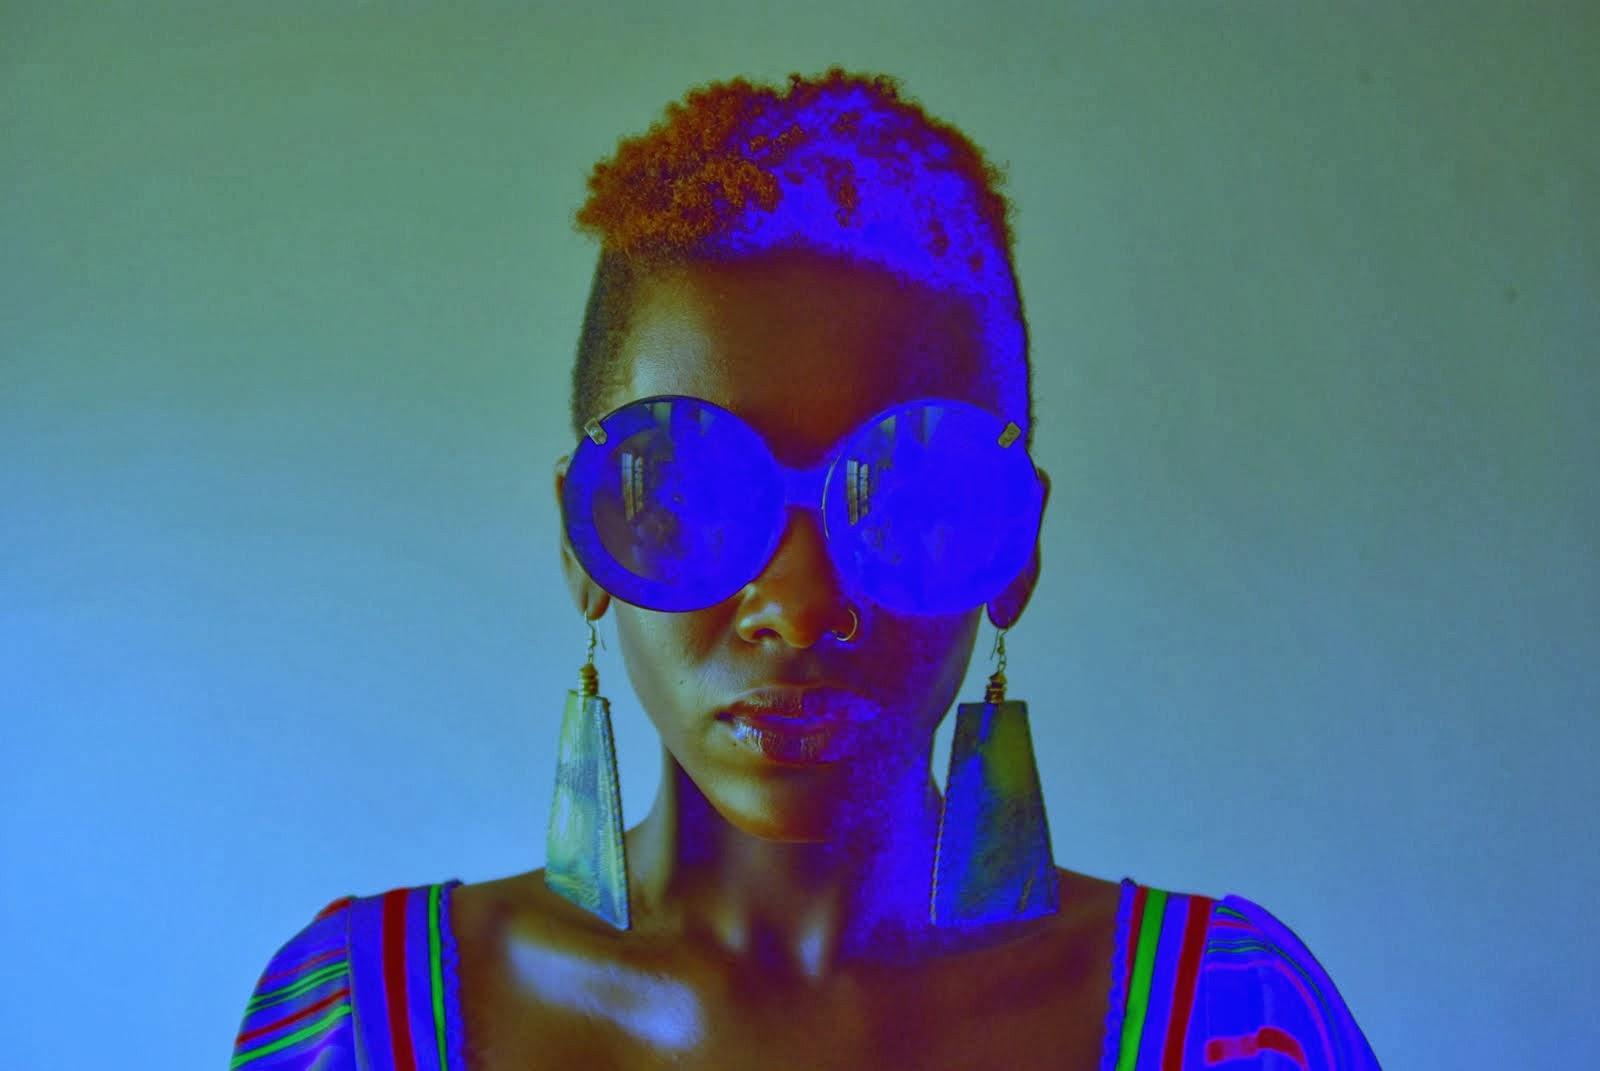 Kwesi Abbensetts: Oluwatoyin Pyne in blue glasses.